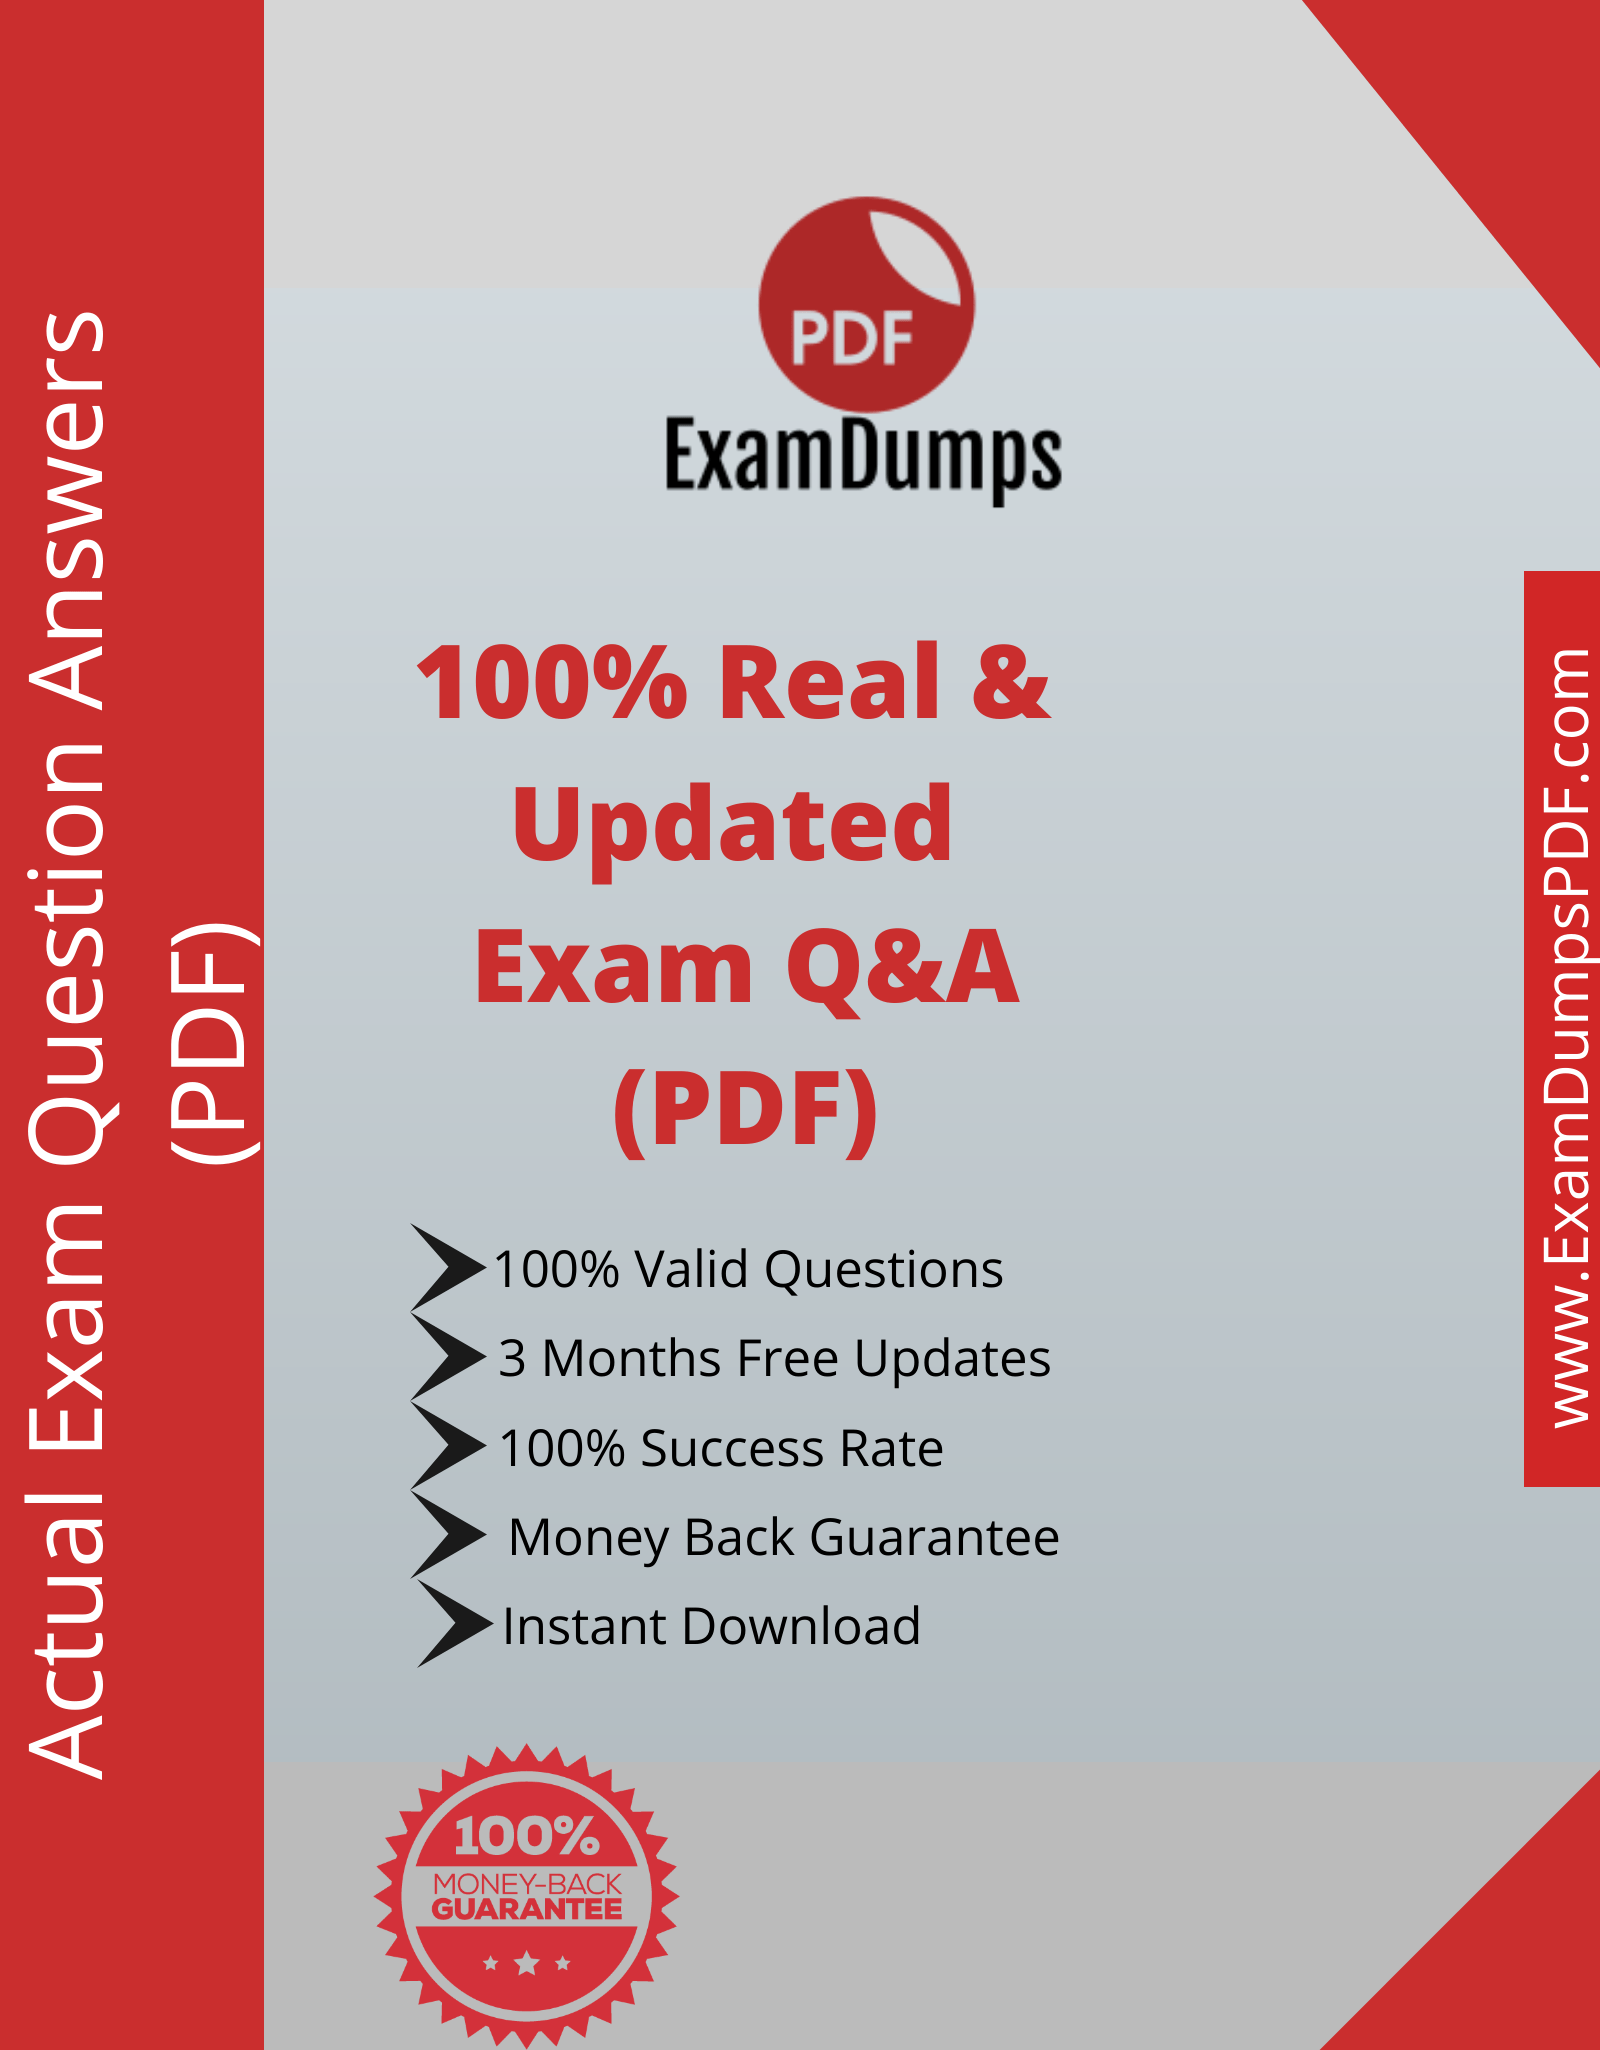 010-151 Exam Dumps 2021